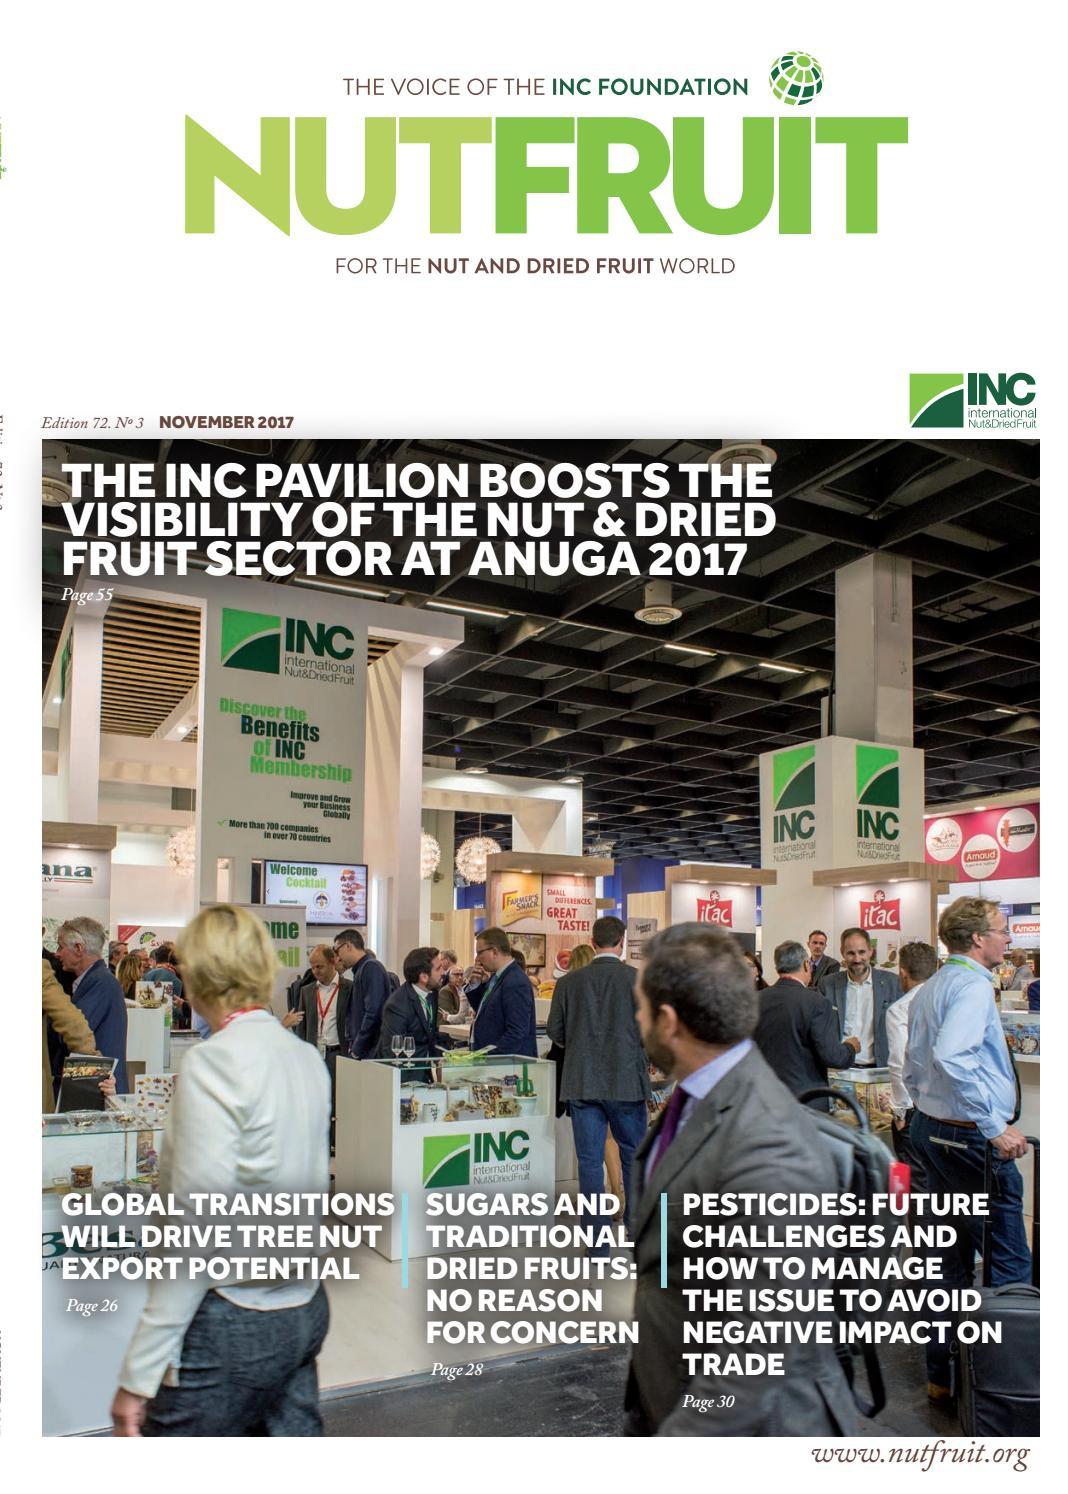 Nutfruit Magazine November 2017 By Inc International Nut Dried Diamond Plain Fresh Milk 949 Ml Fruit Council Issuu